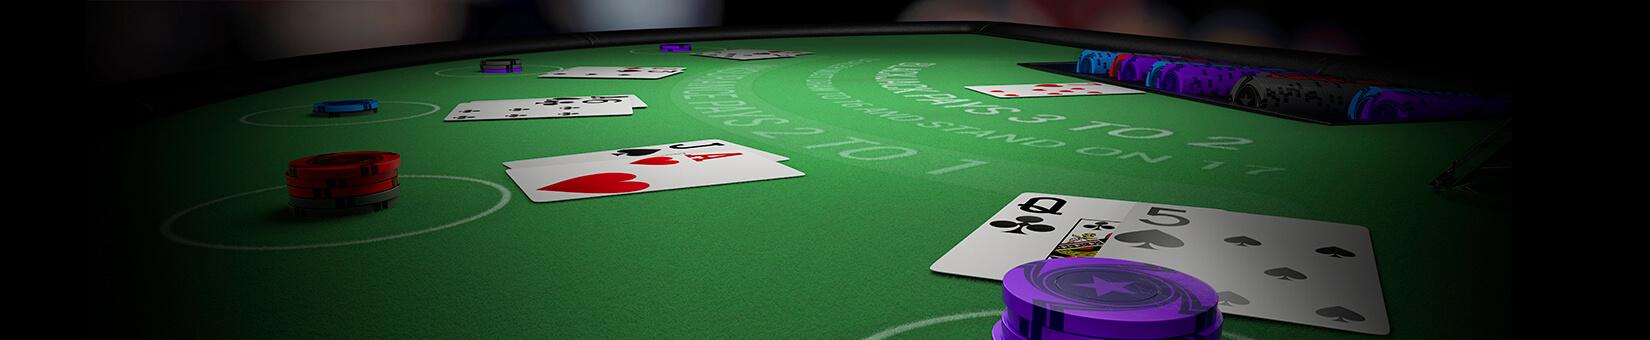 Casino Regeln 598932